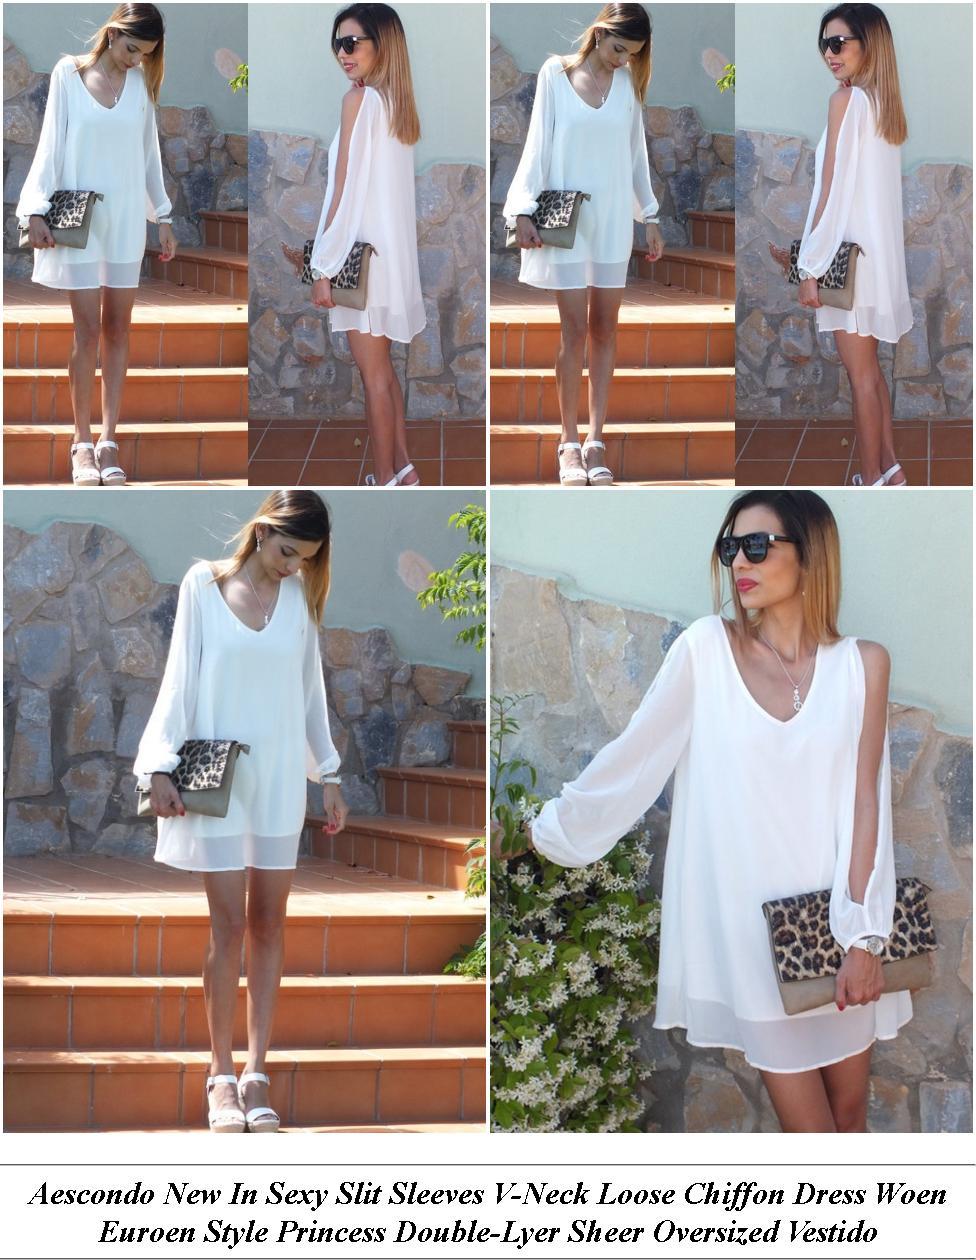 Plus Size Semi Formal Dresses - Baby Sale Uk - White Dress - Cheap Clothes Uk